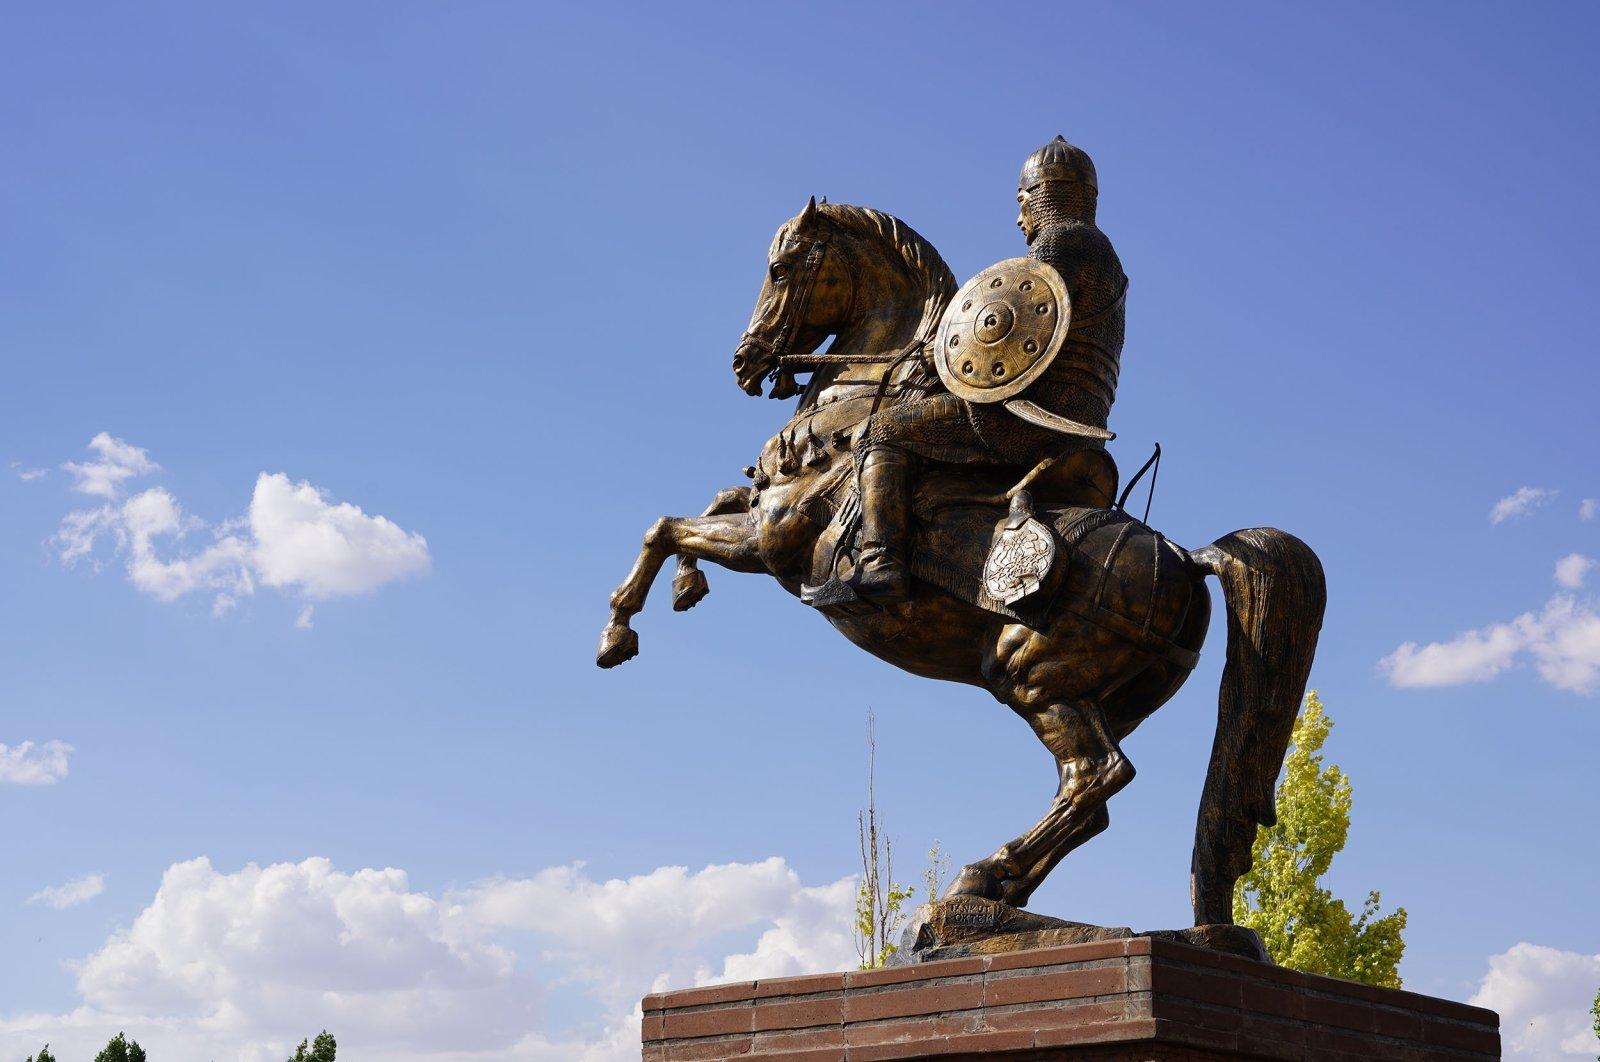 Statue of Alp Arslan in Malazgirt, Muş, Turkey, July 8, 2021. (Shutterstock Photo)